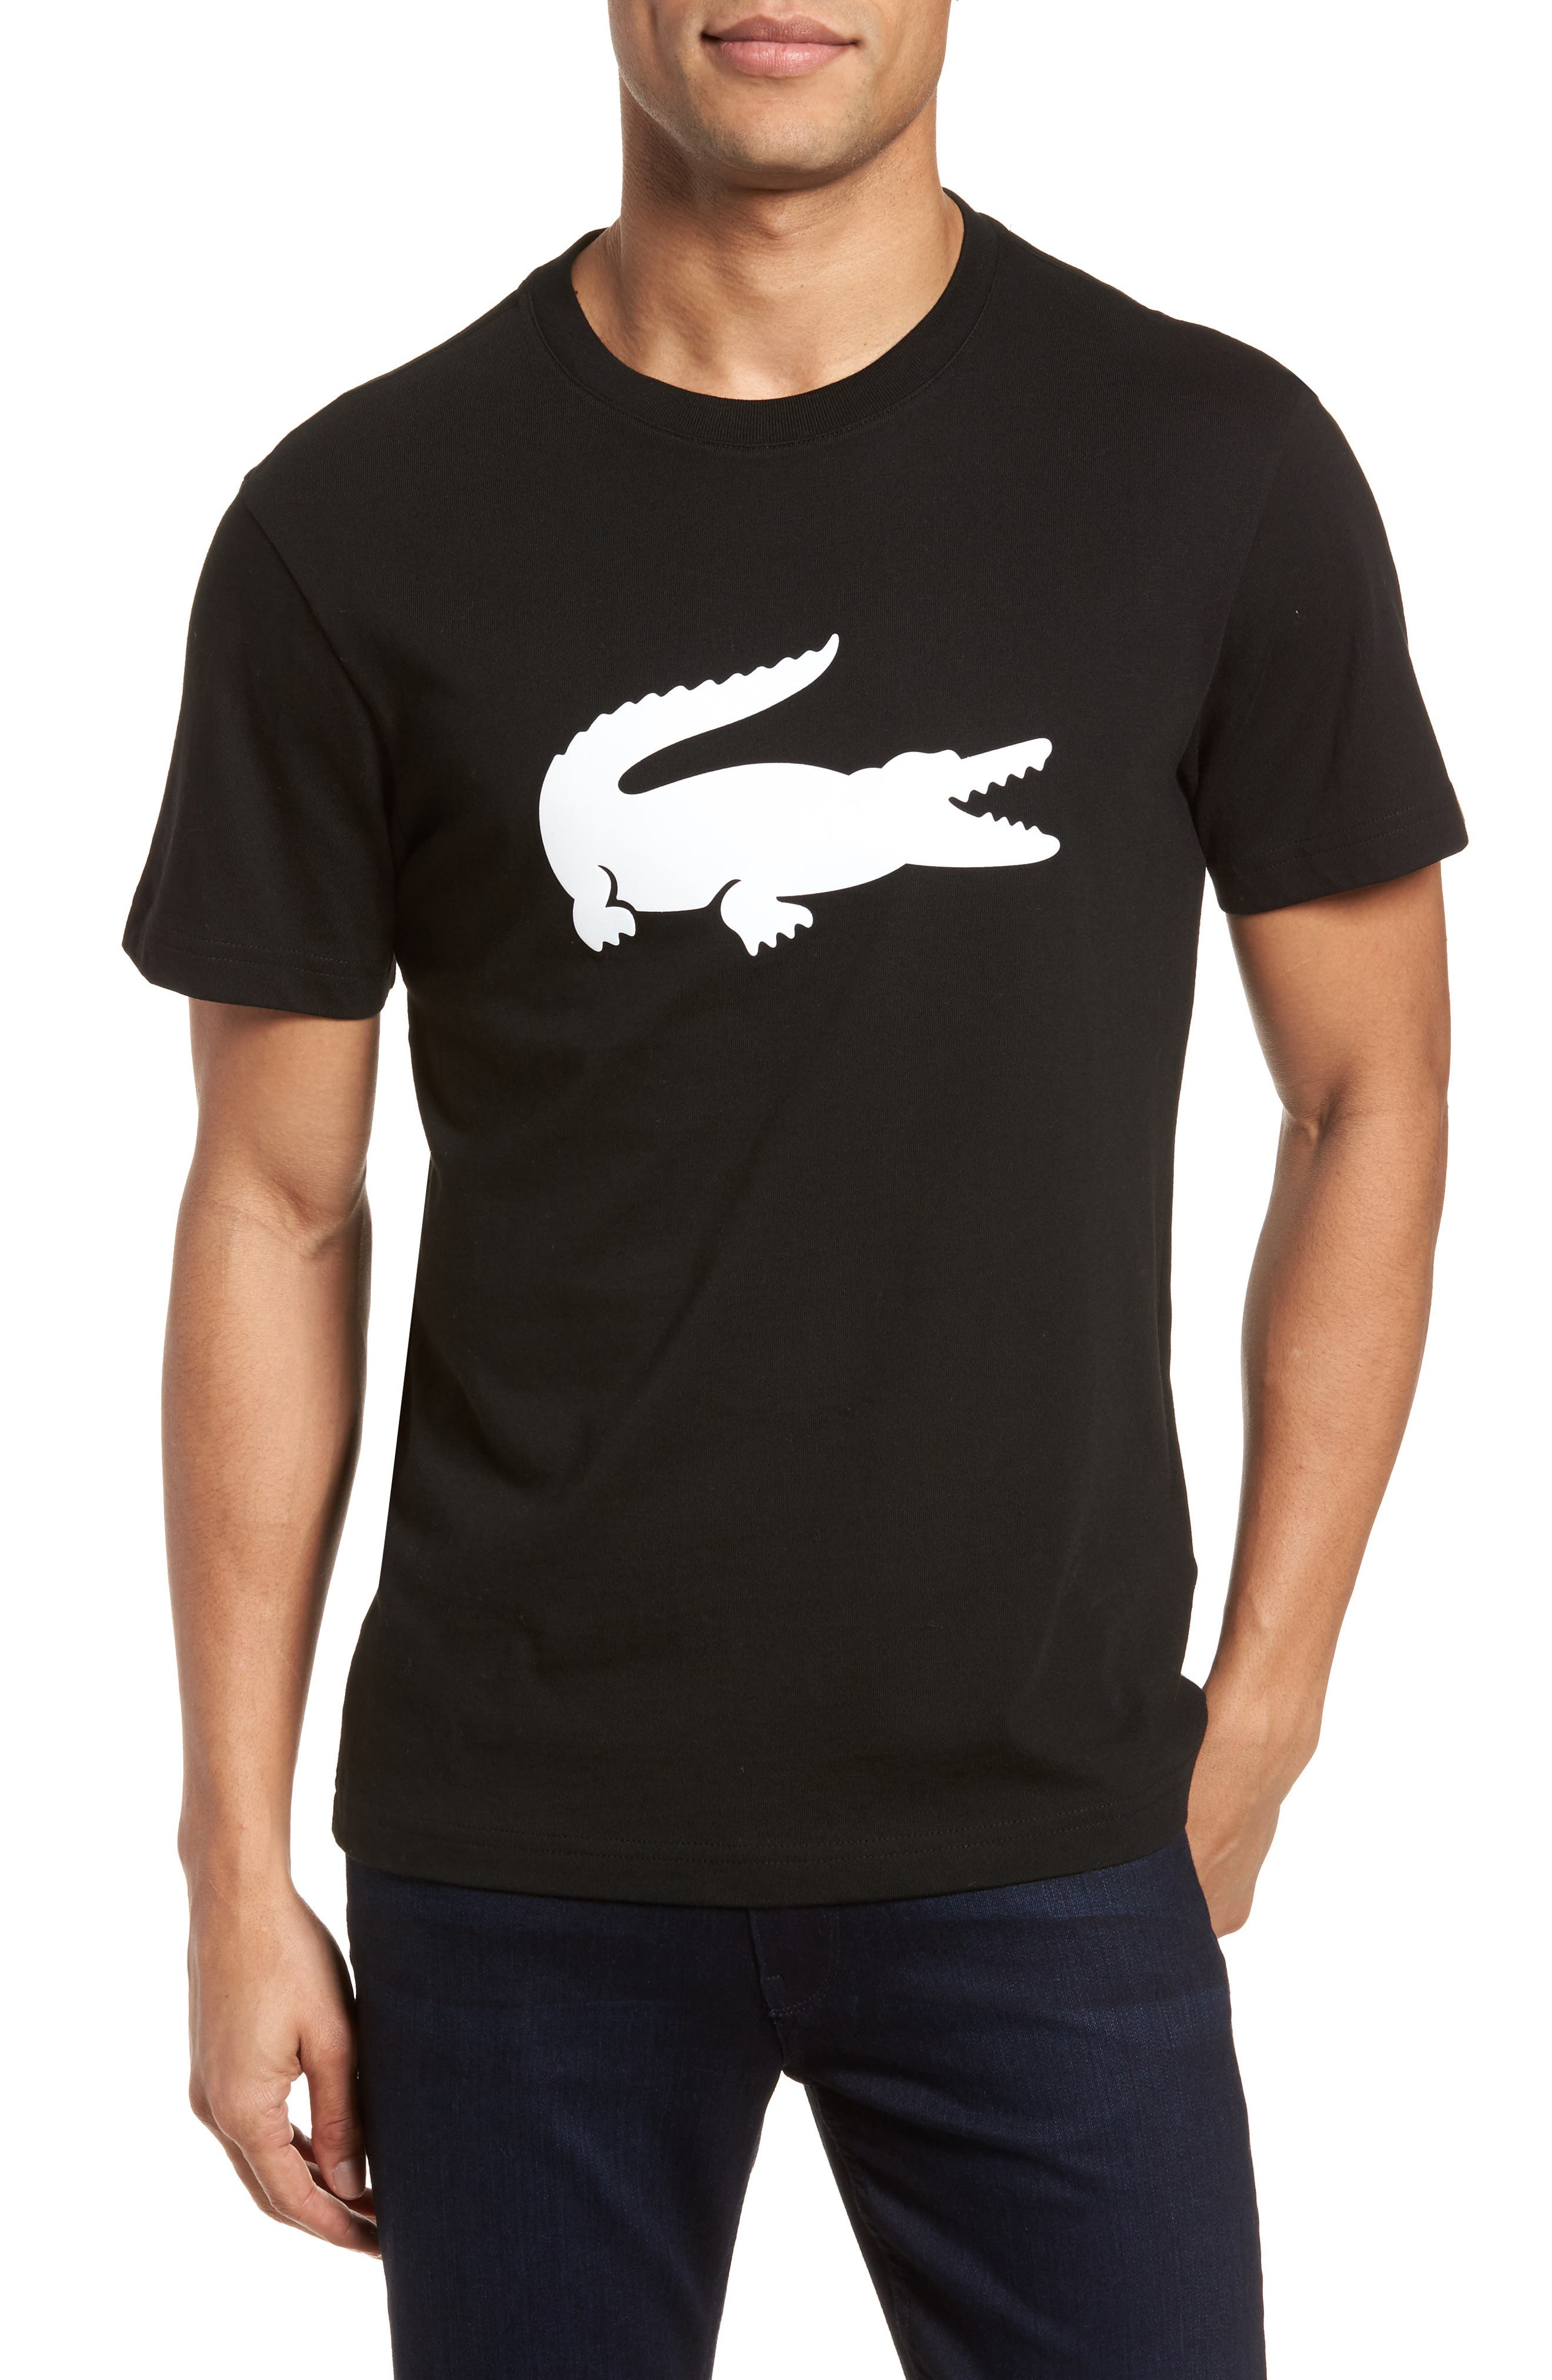 Crocodile T-Shirt,                             Main thumbnail 1, color,                             258 Black/ White